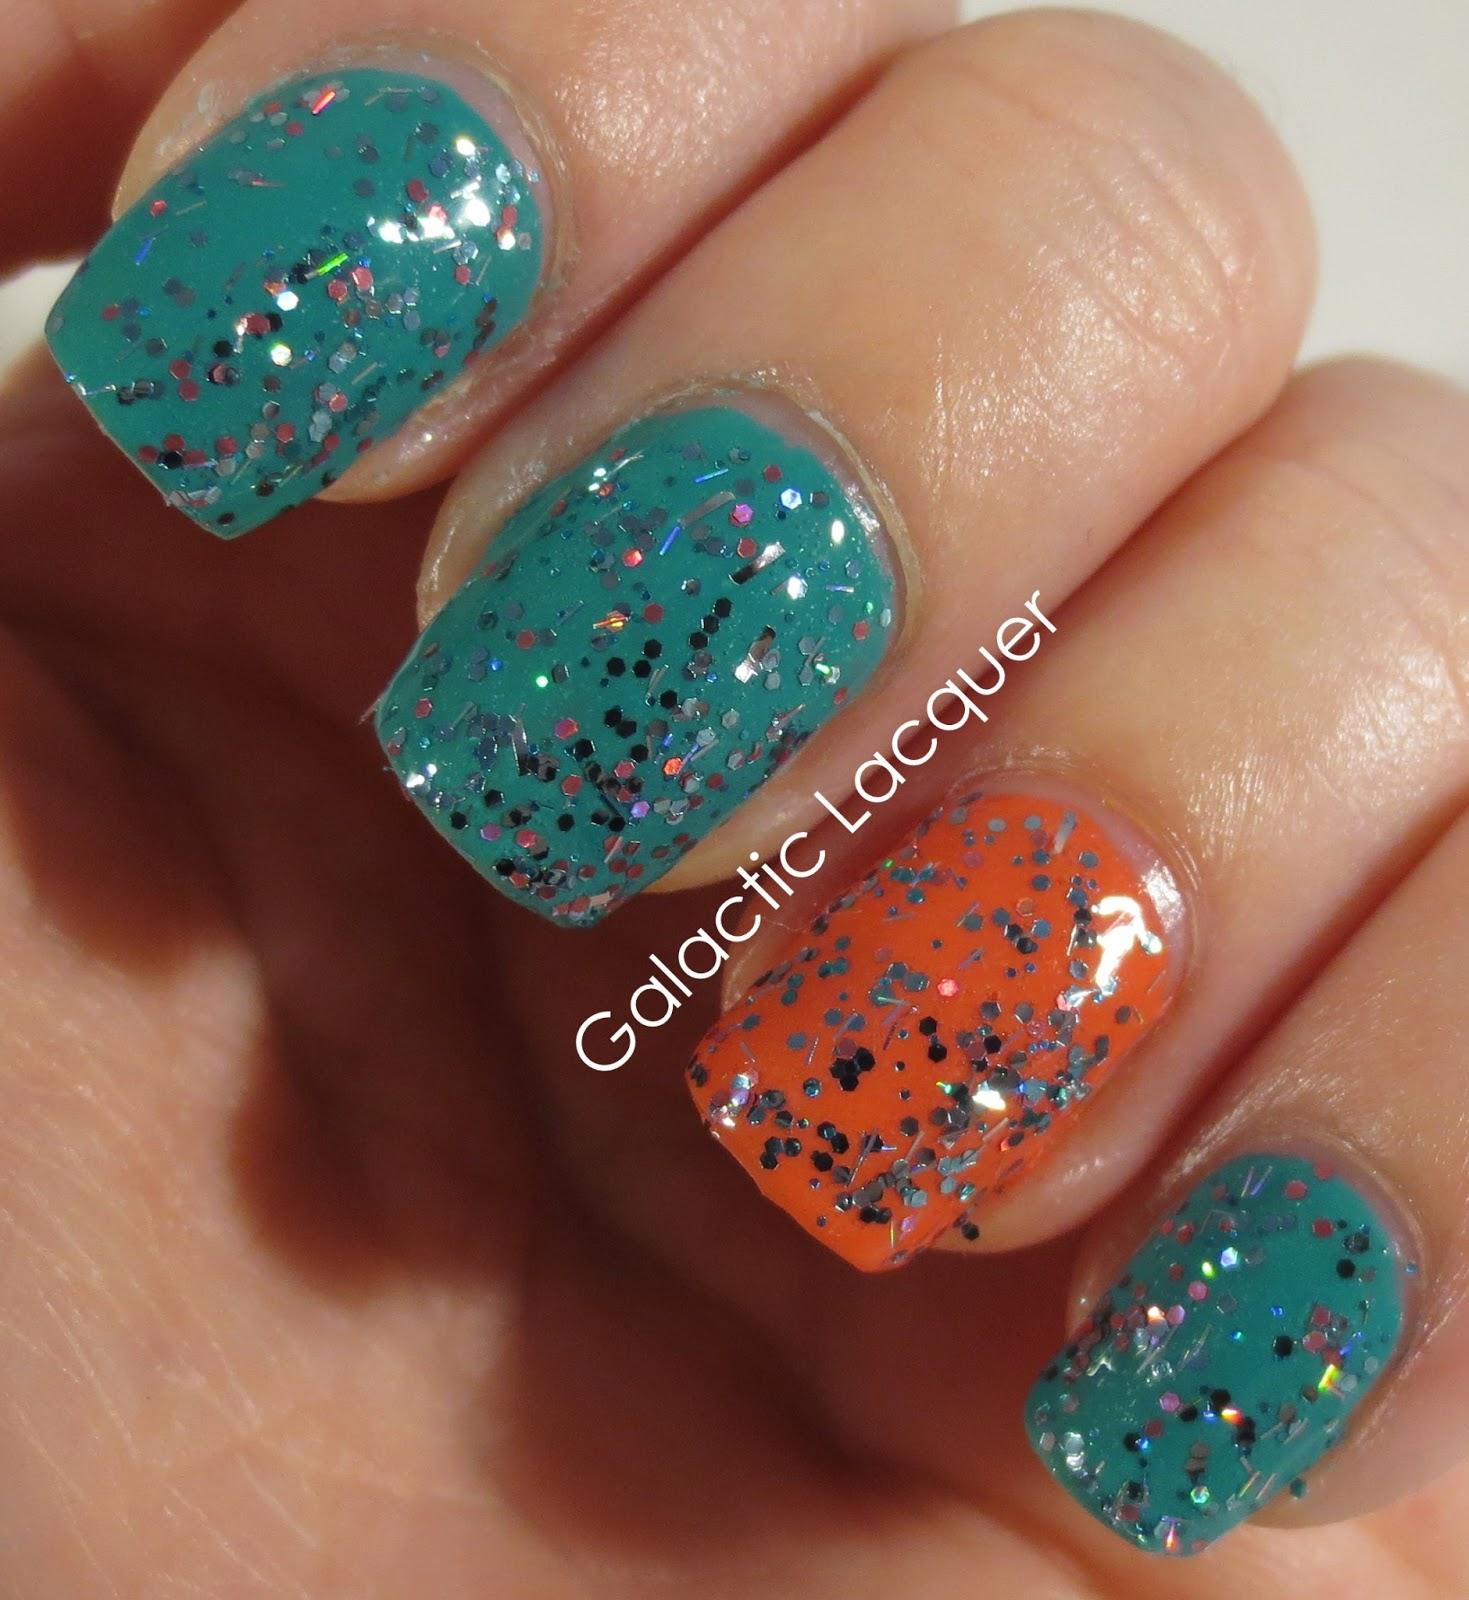 Little Mermaid Nails: Galactic Lacquer: I Love Nail Polish